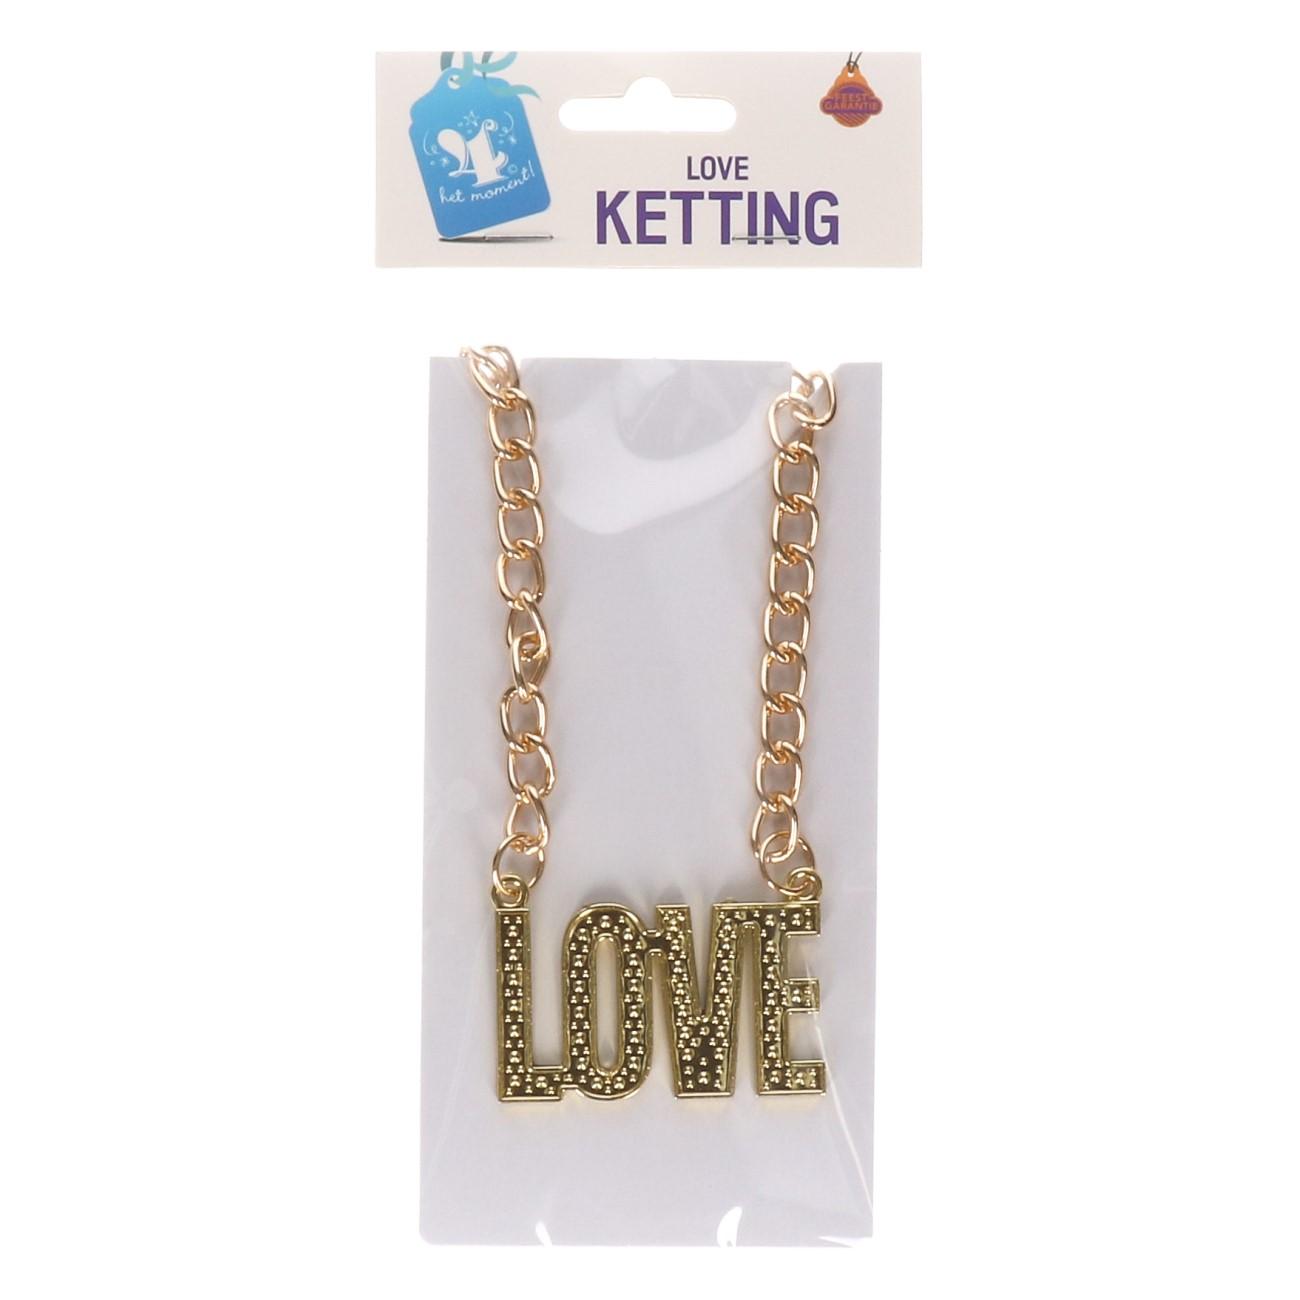 Ketting love #869